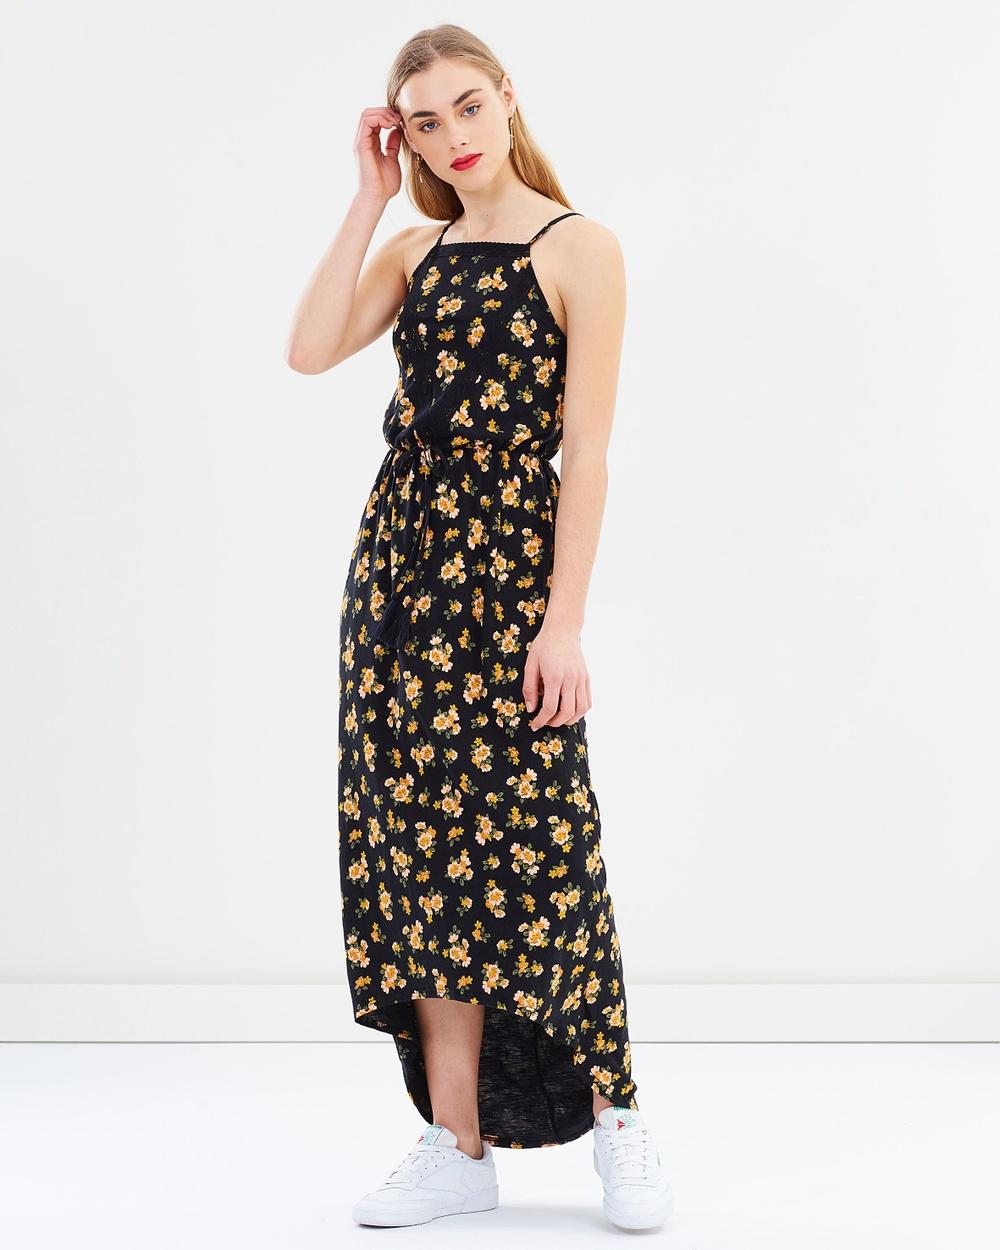 Miss Selfridge Blossom Maxi Dress Printed Dresses Black Blossom Maxi Dress